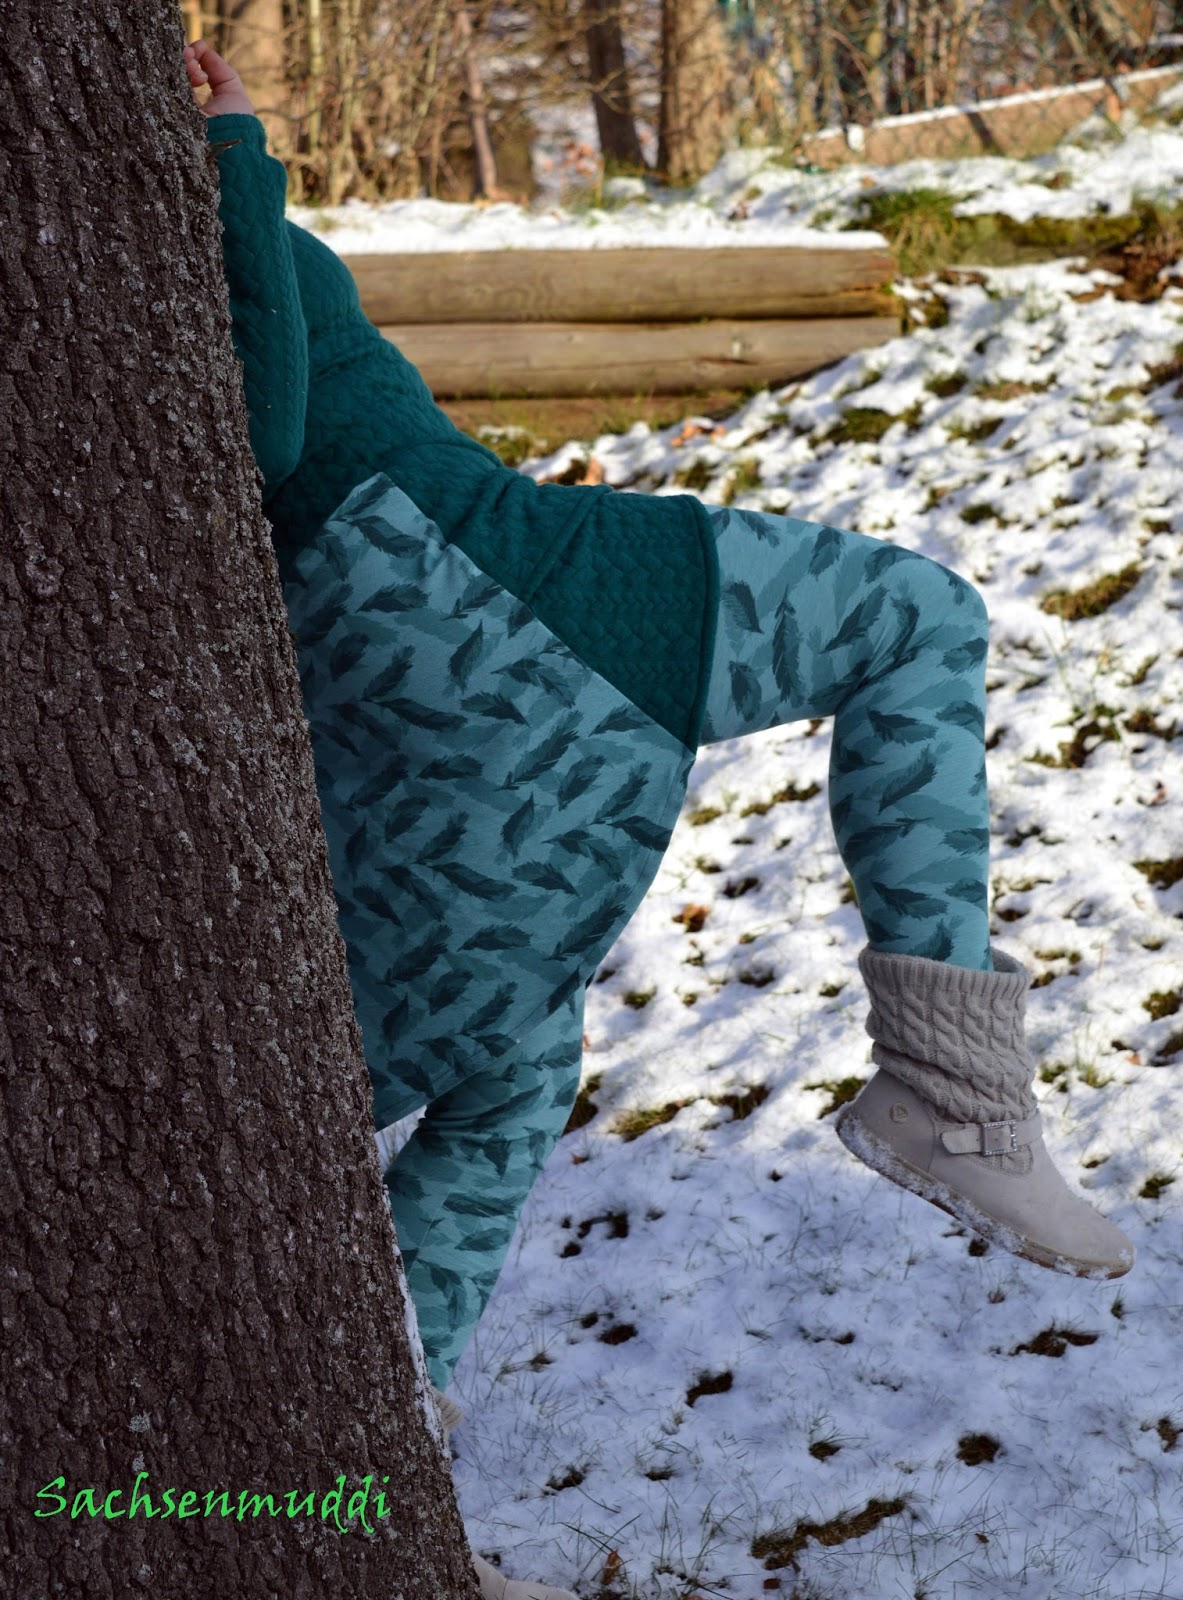 shop Coated Textiles: